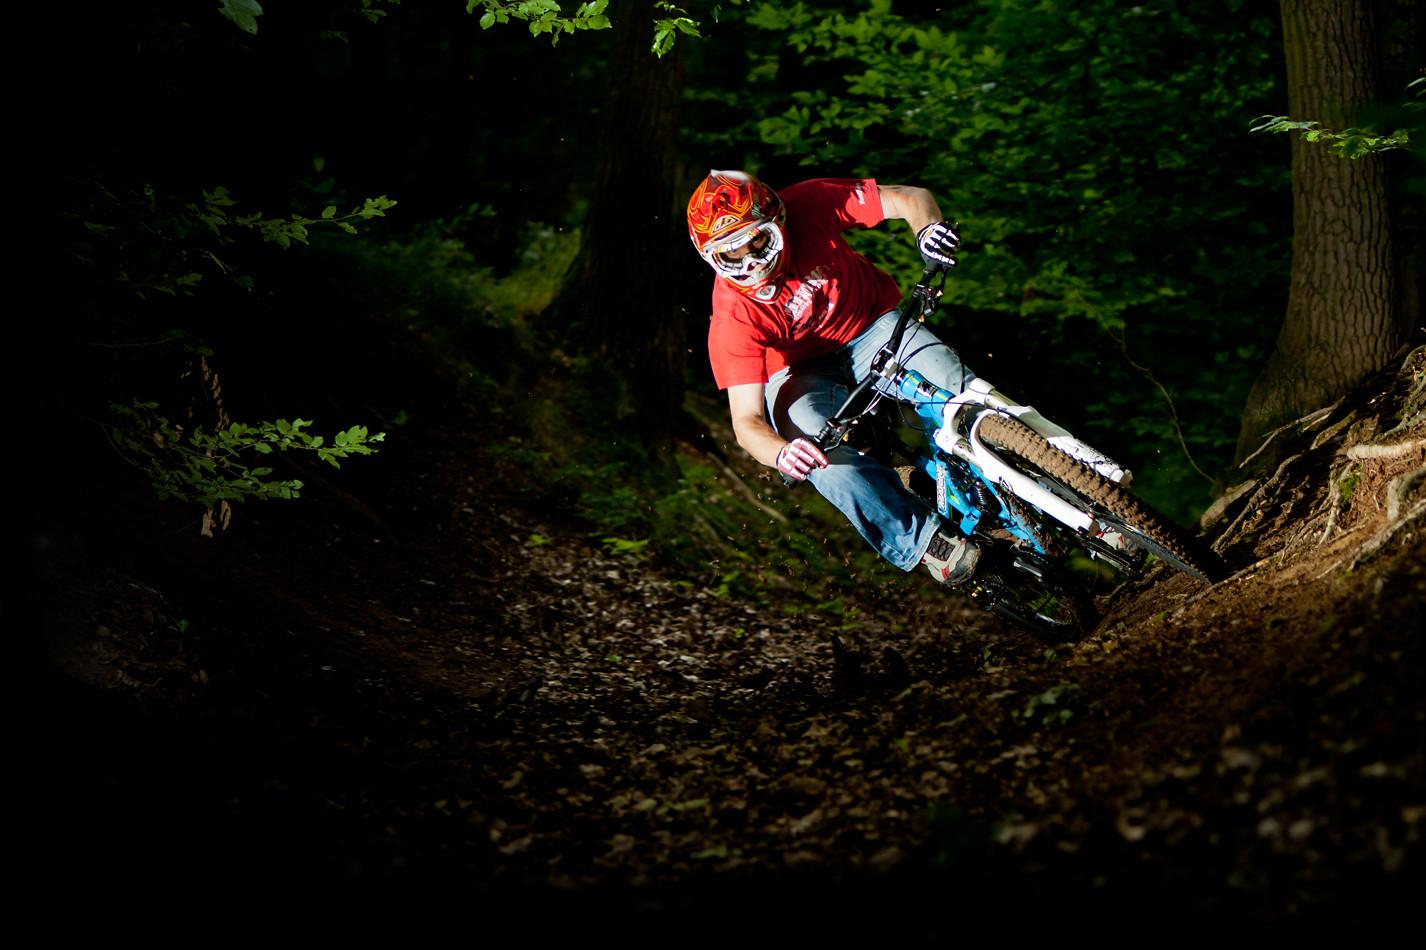 flash1 - Kusa - Mountain Biking Pictures - Vital MTB